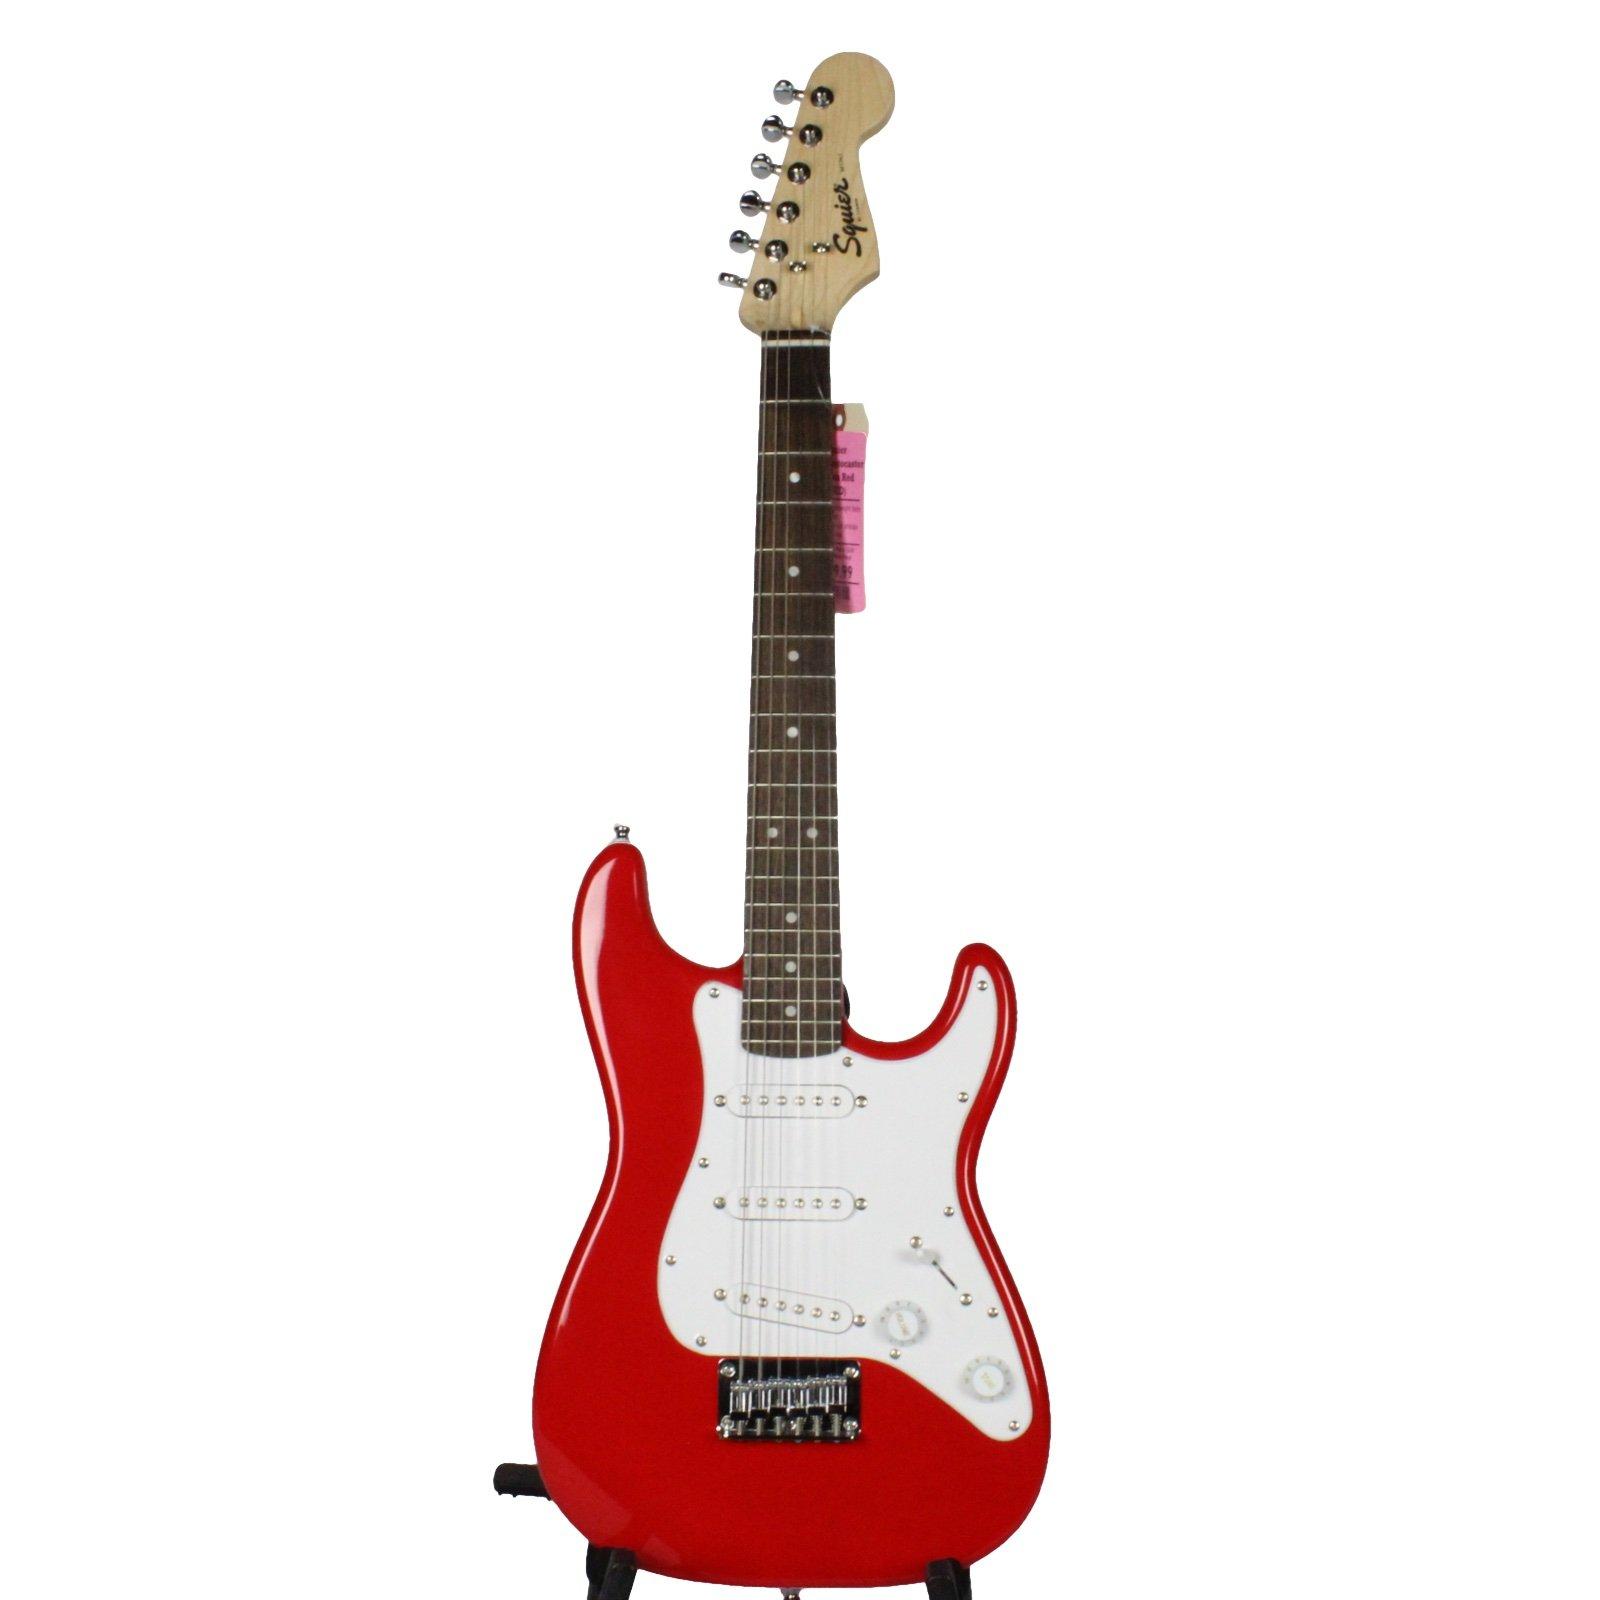 Squier Mini Stratocaster, Dakota Red (USED)